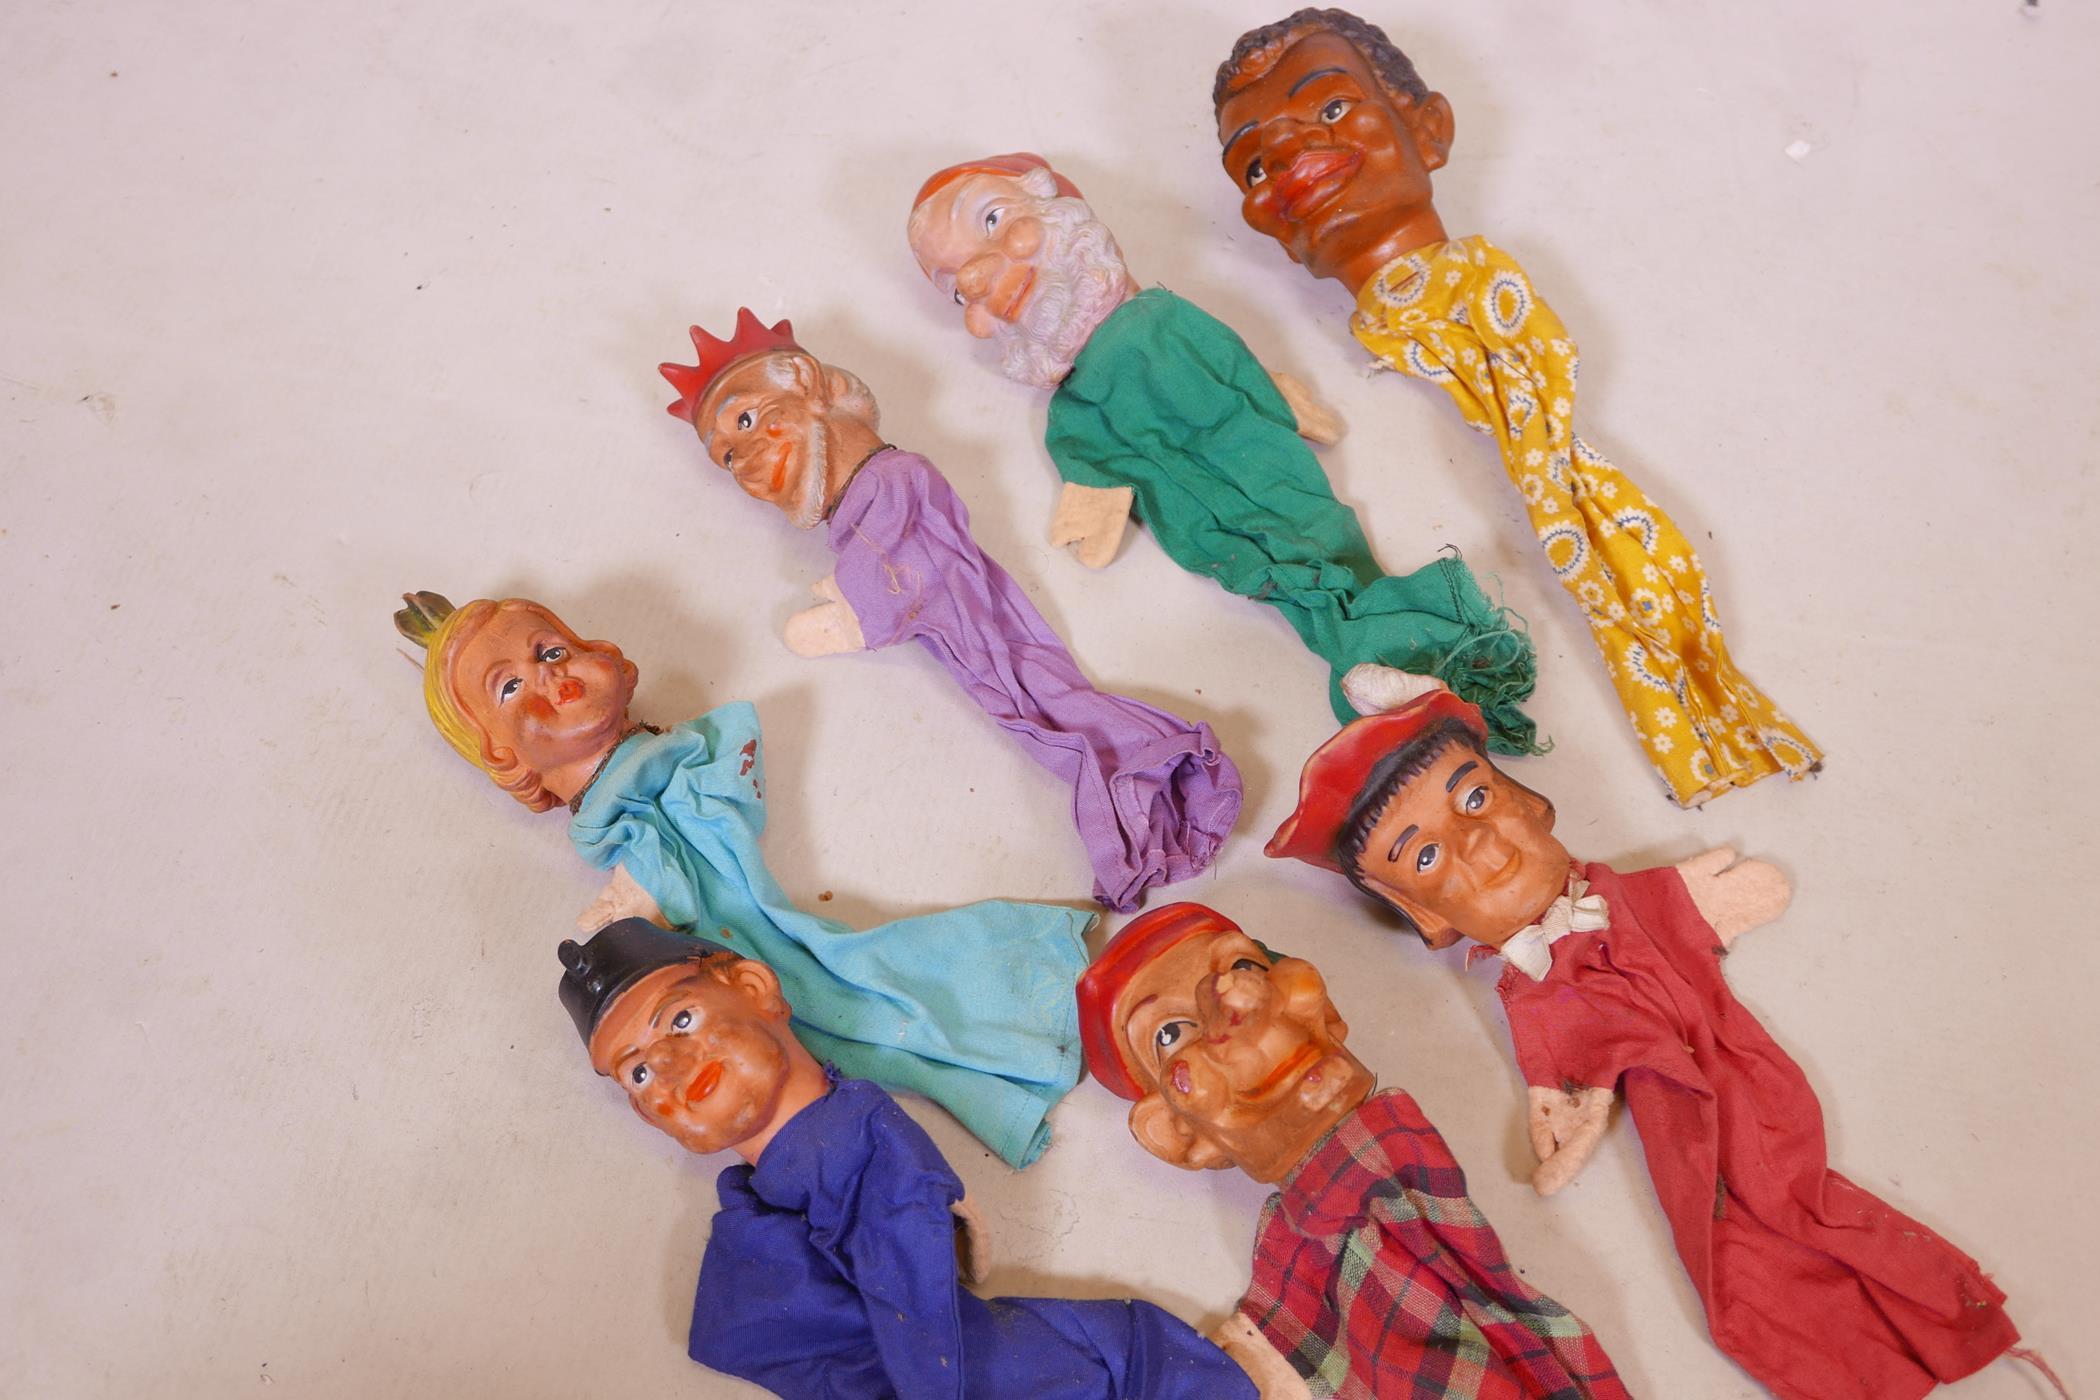 Seven vintage glove puppets